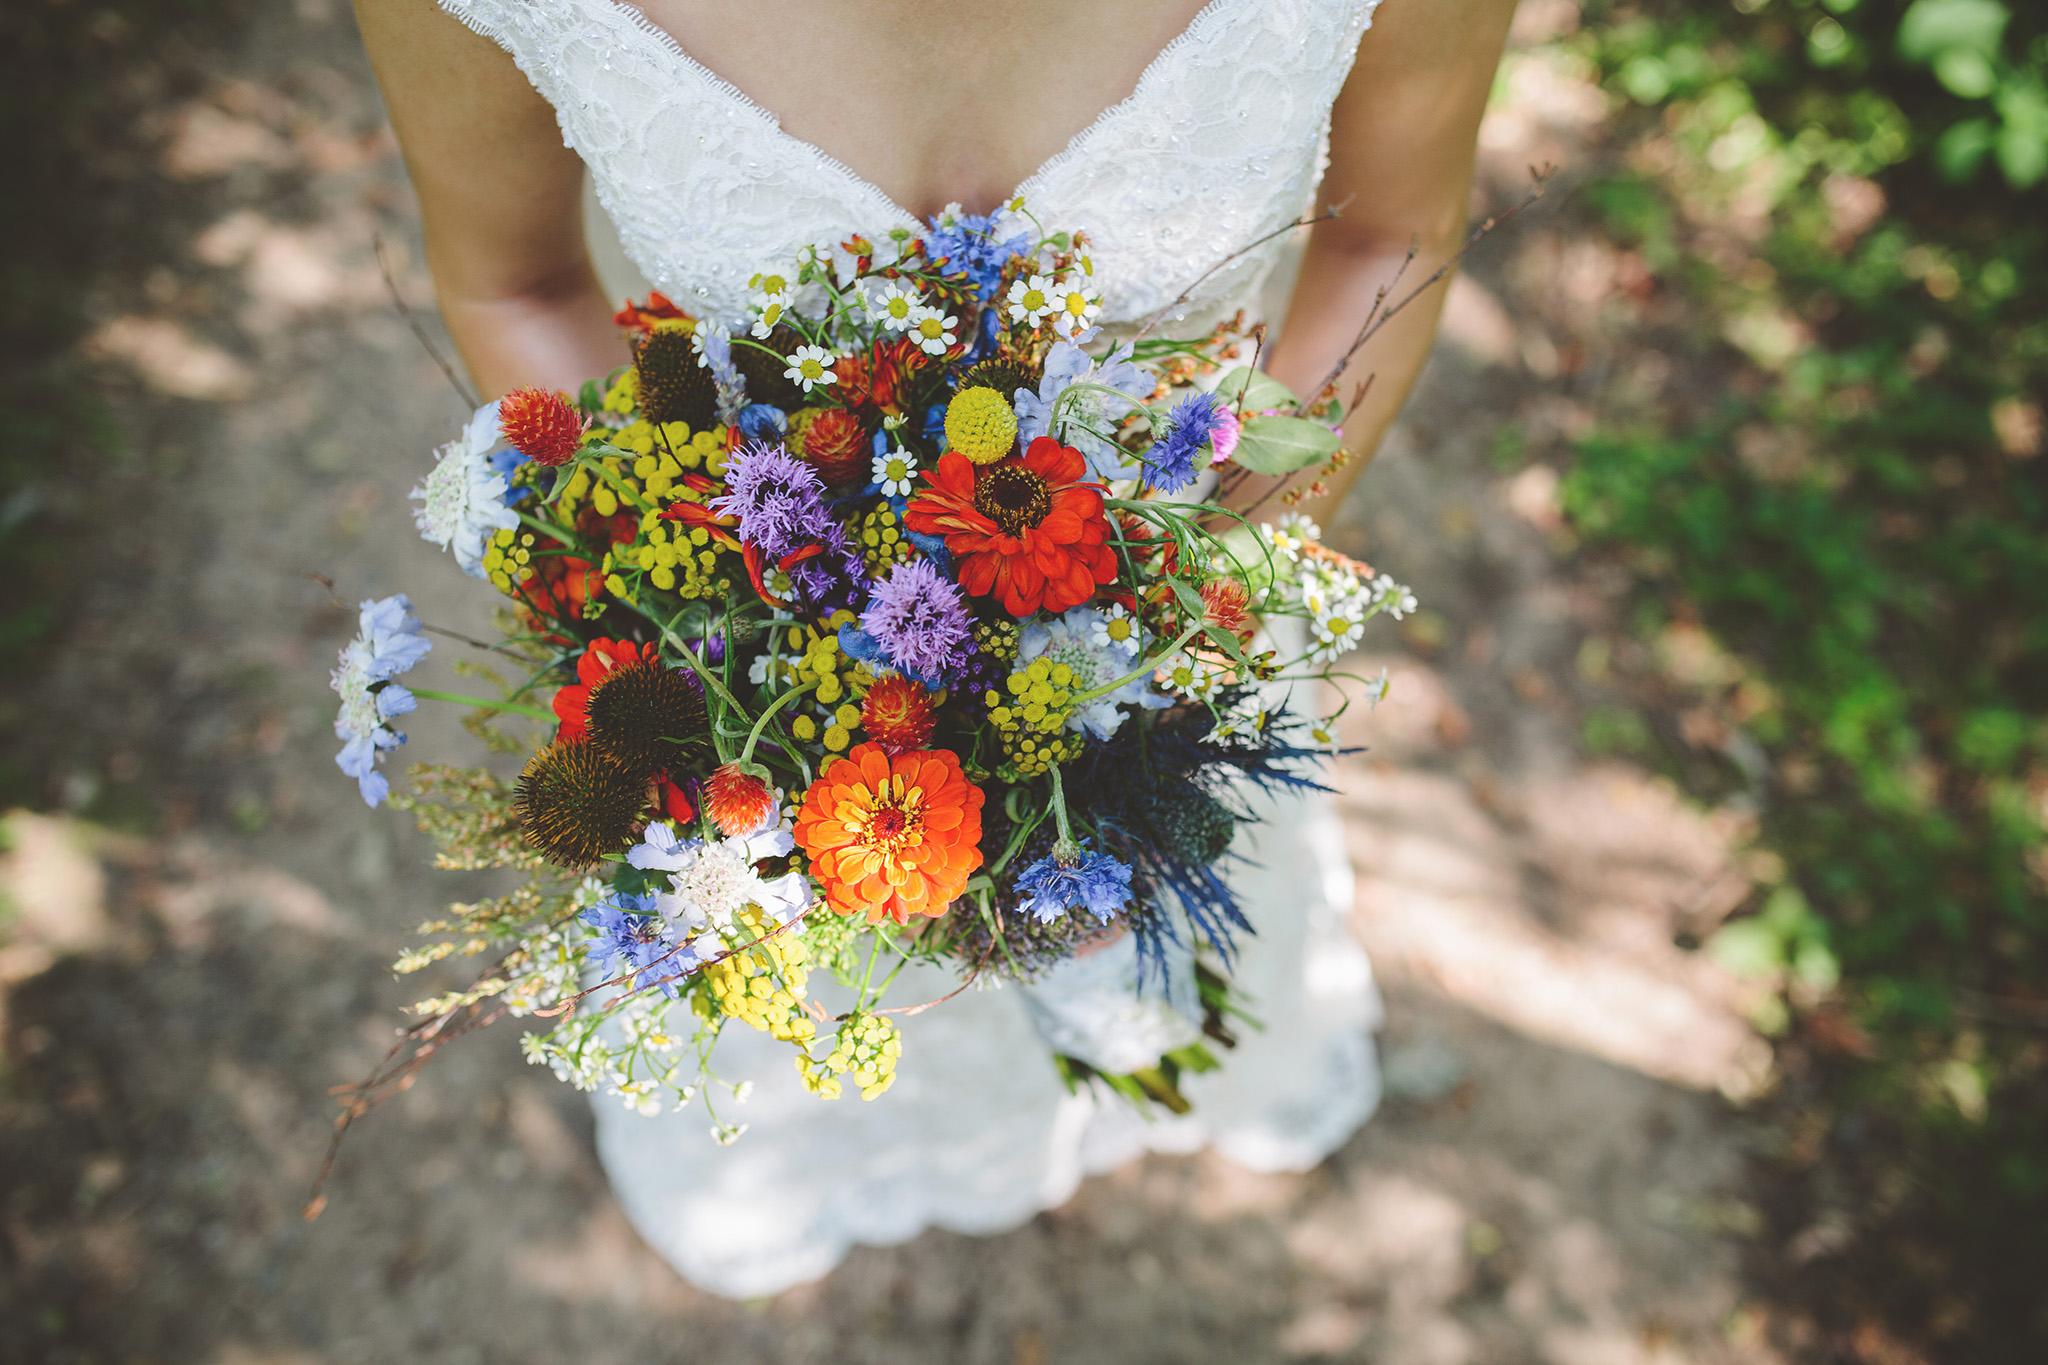 the-bees-knees-floral-design-studio-brainerd-mn-minnesota-wedding-florist-bride-sharayah-wildflower-wedding-bouquet-the-shalom-imaginative